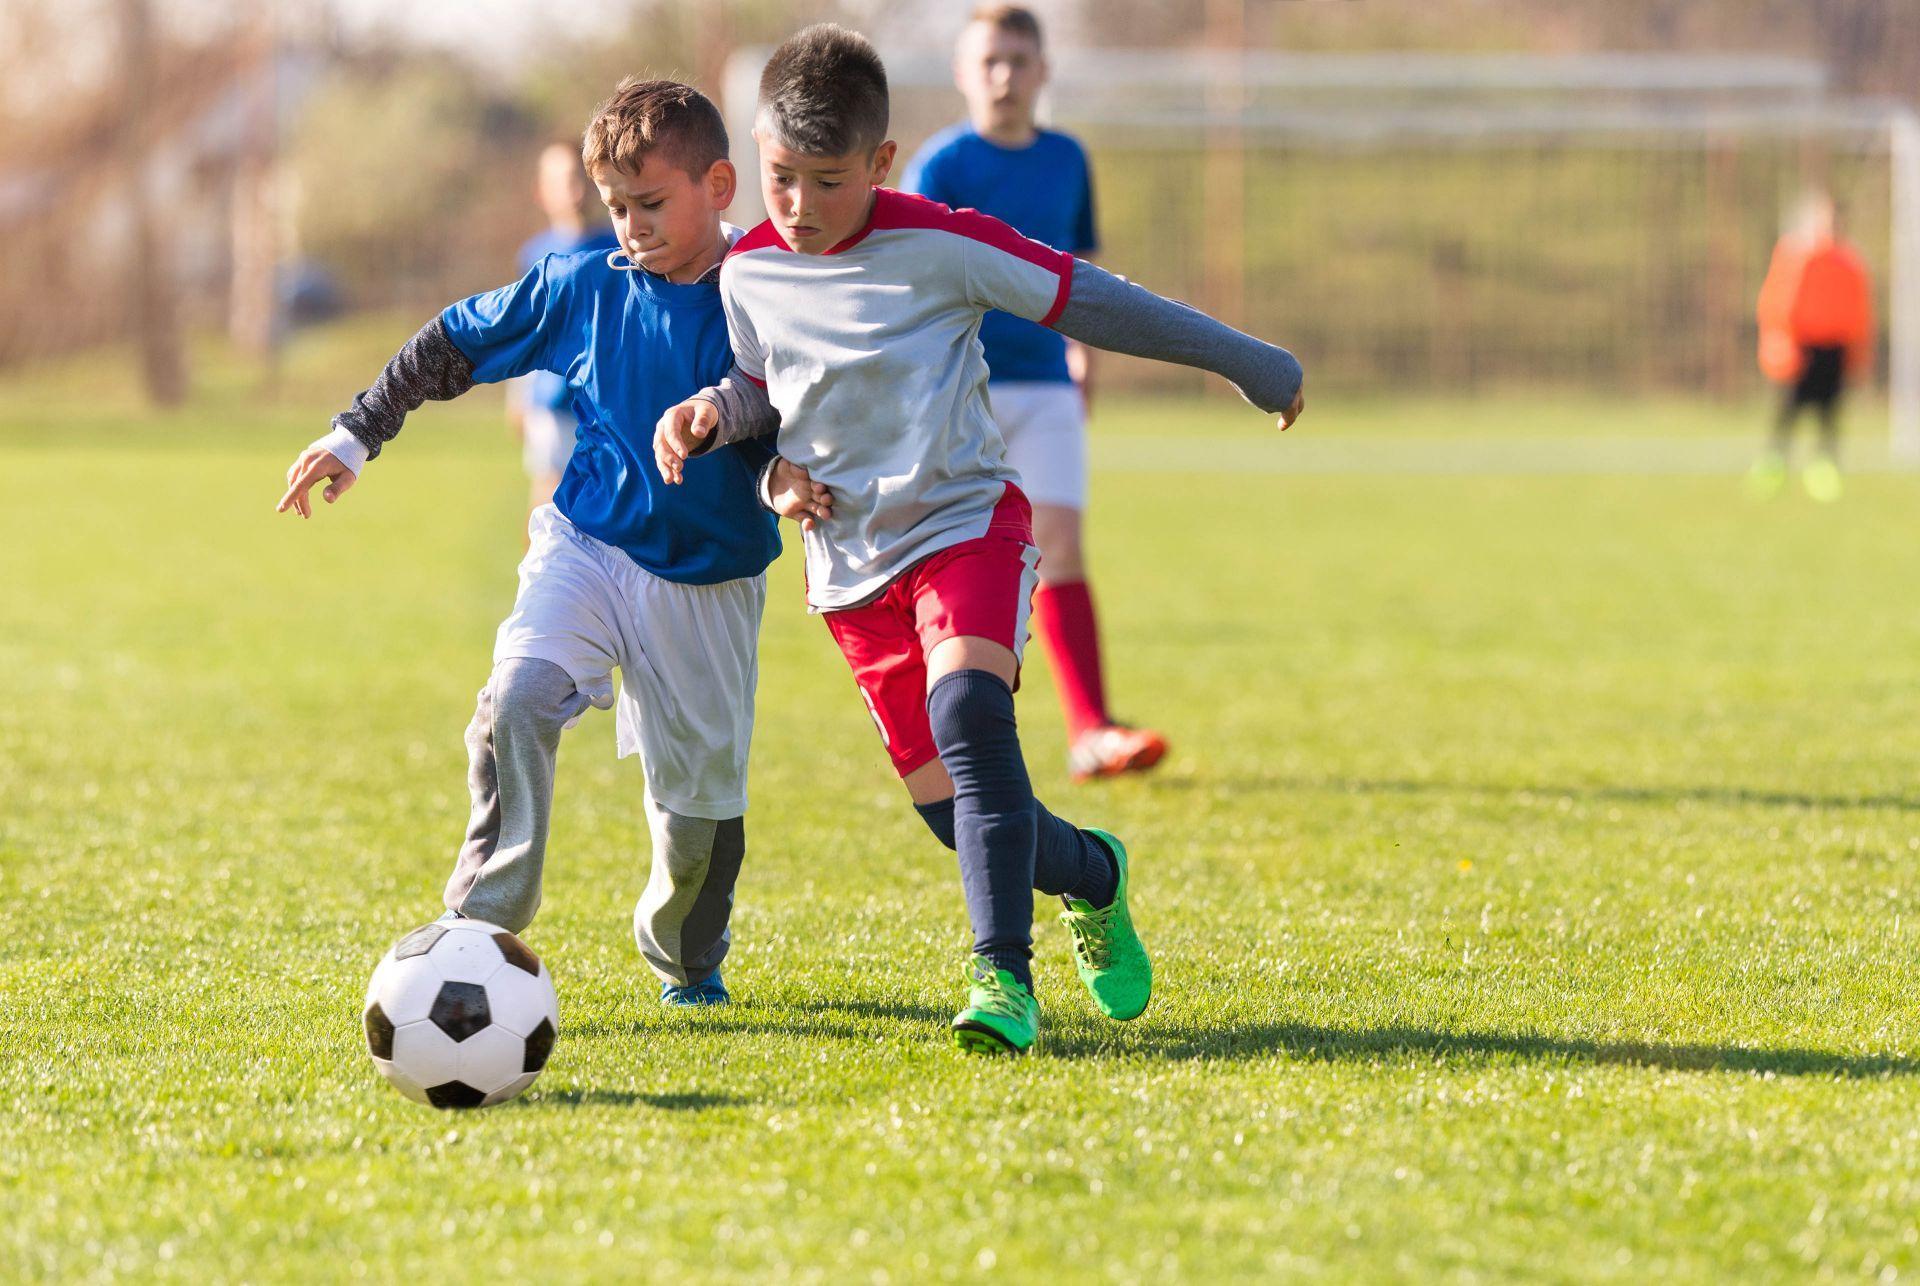 Greece sports: Football